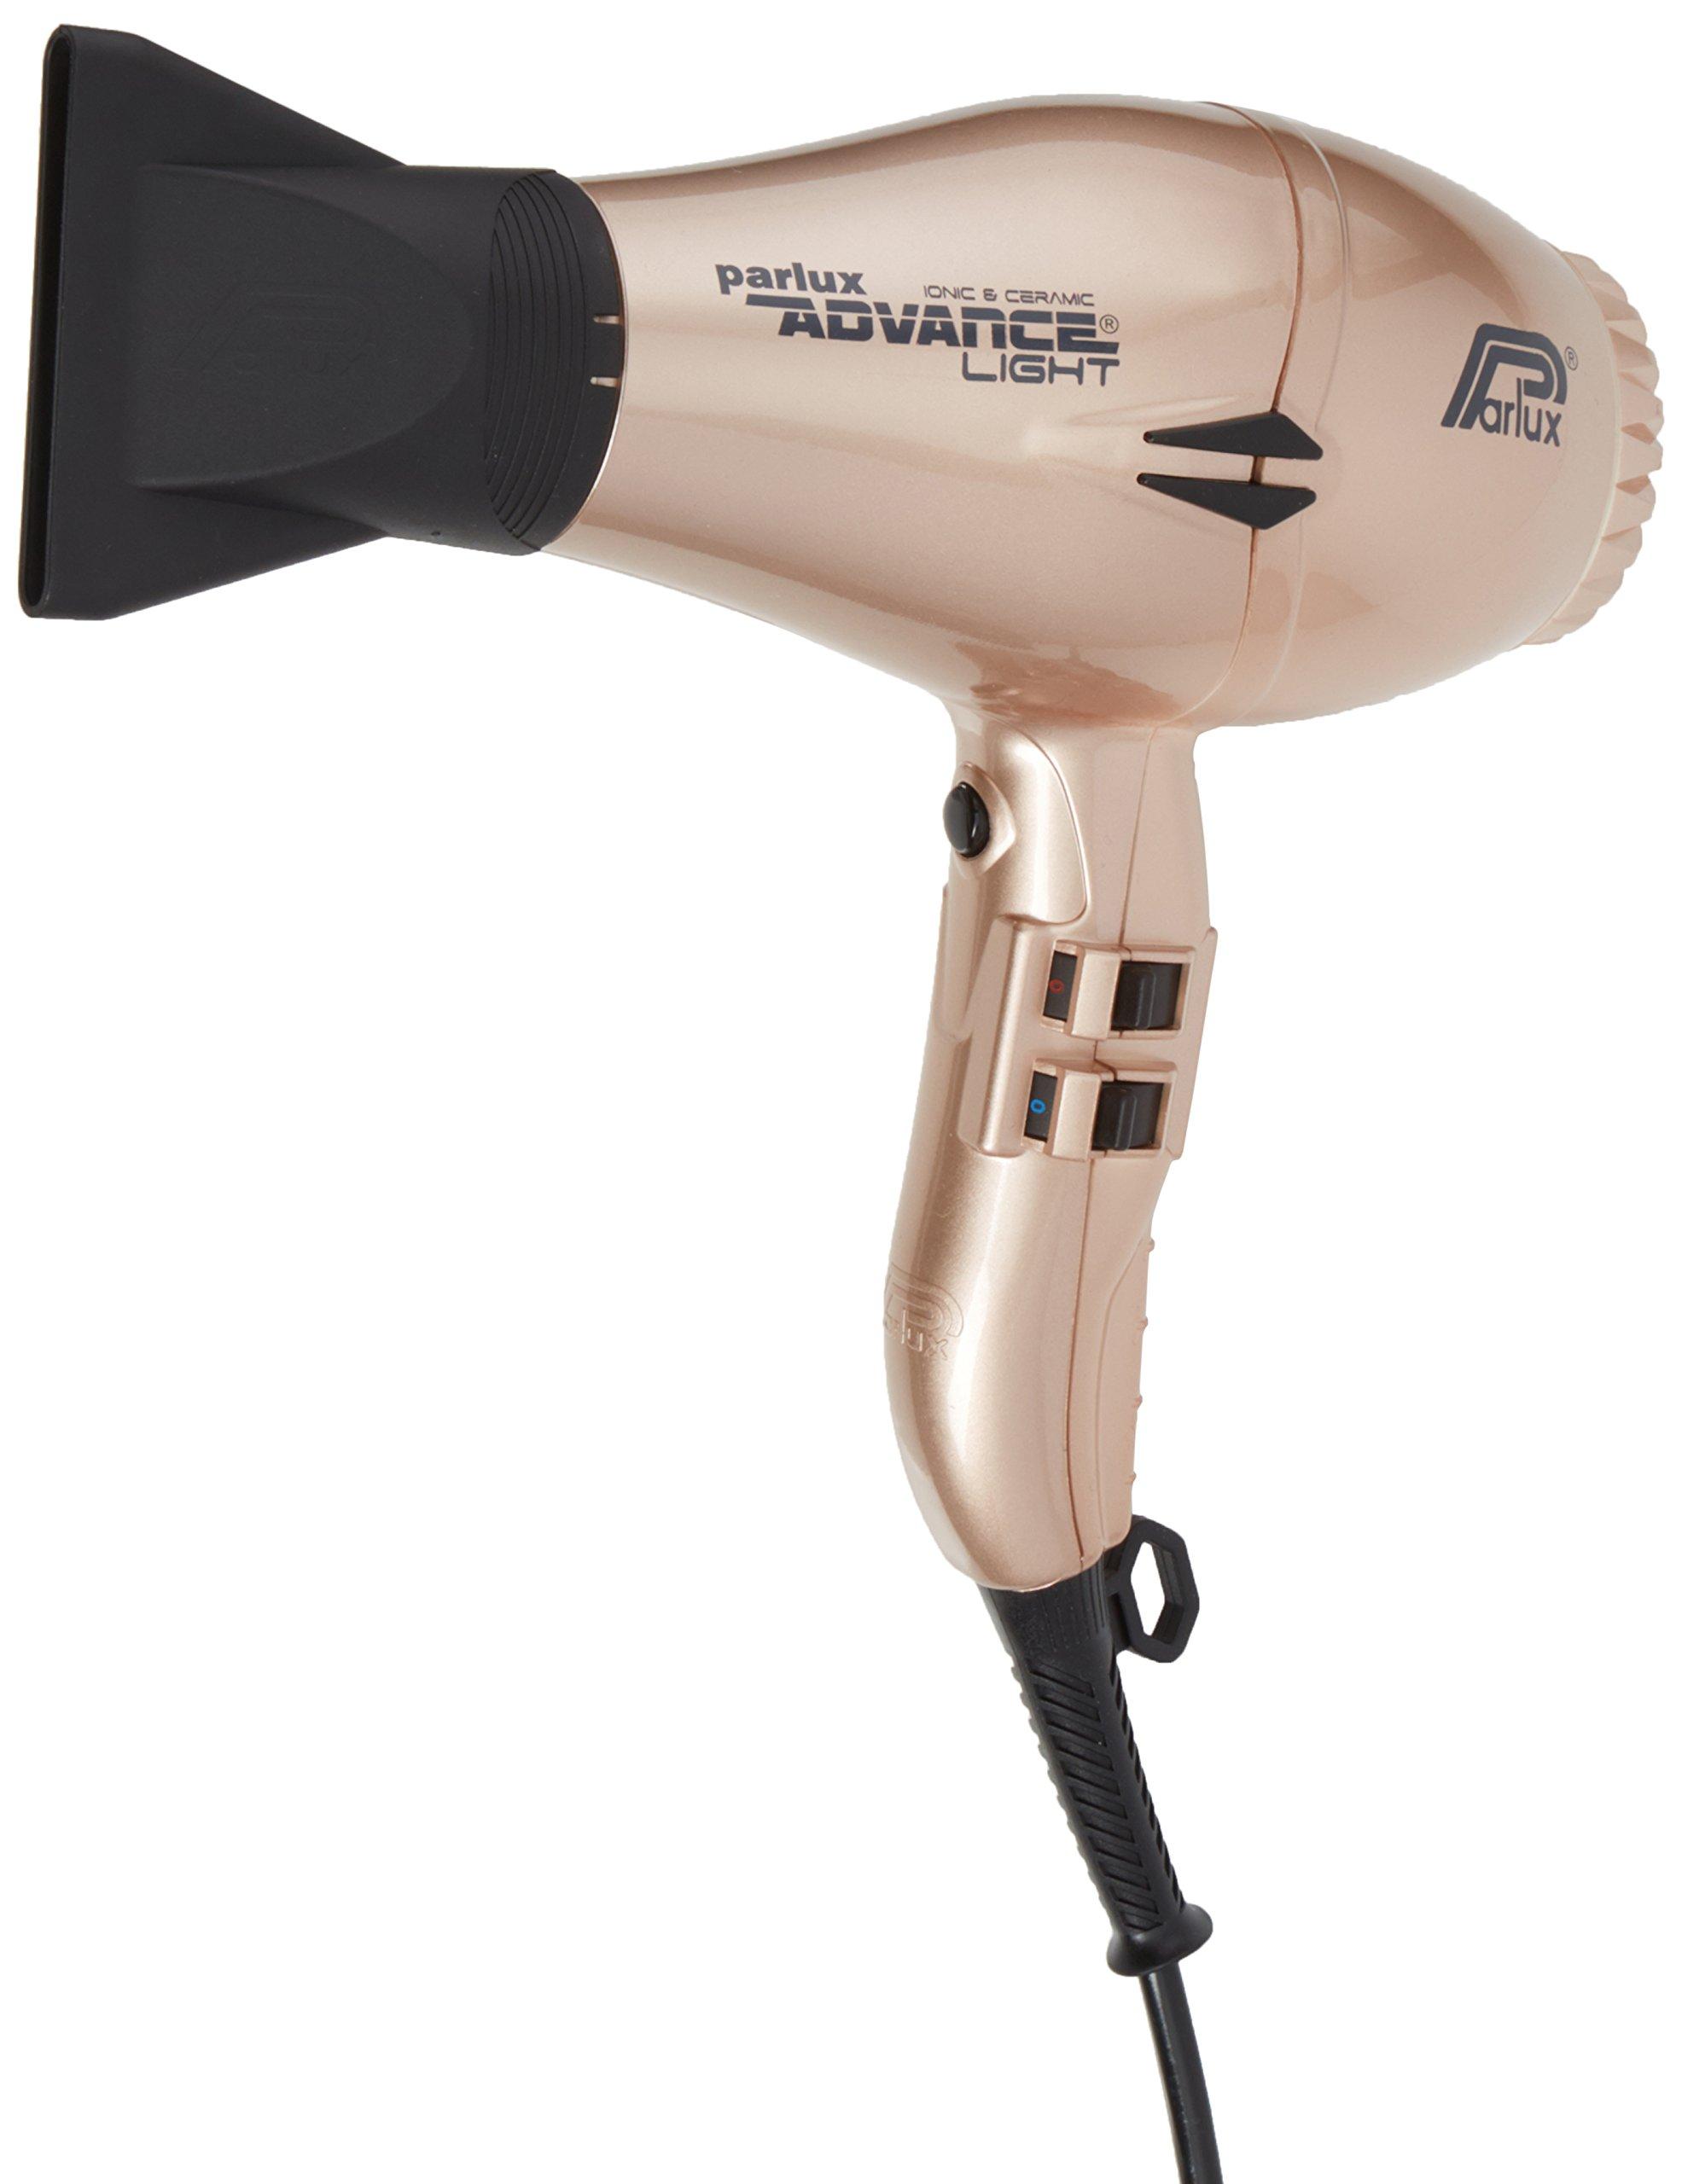 Parlux Advance Light Ceramic Hairdryer